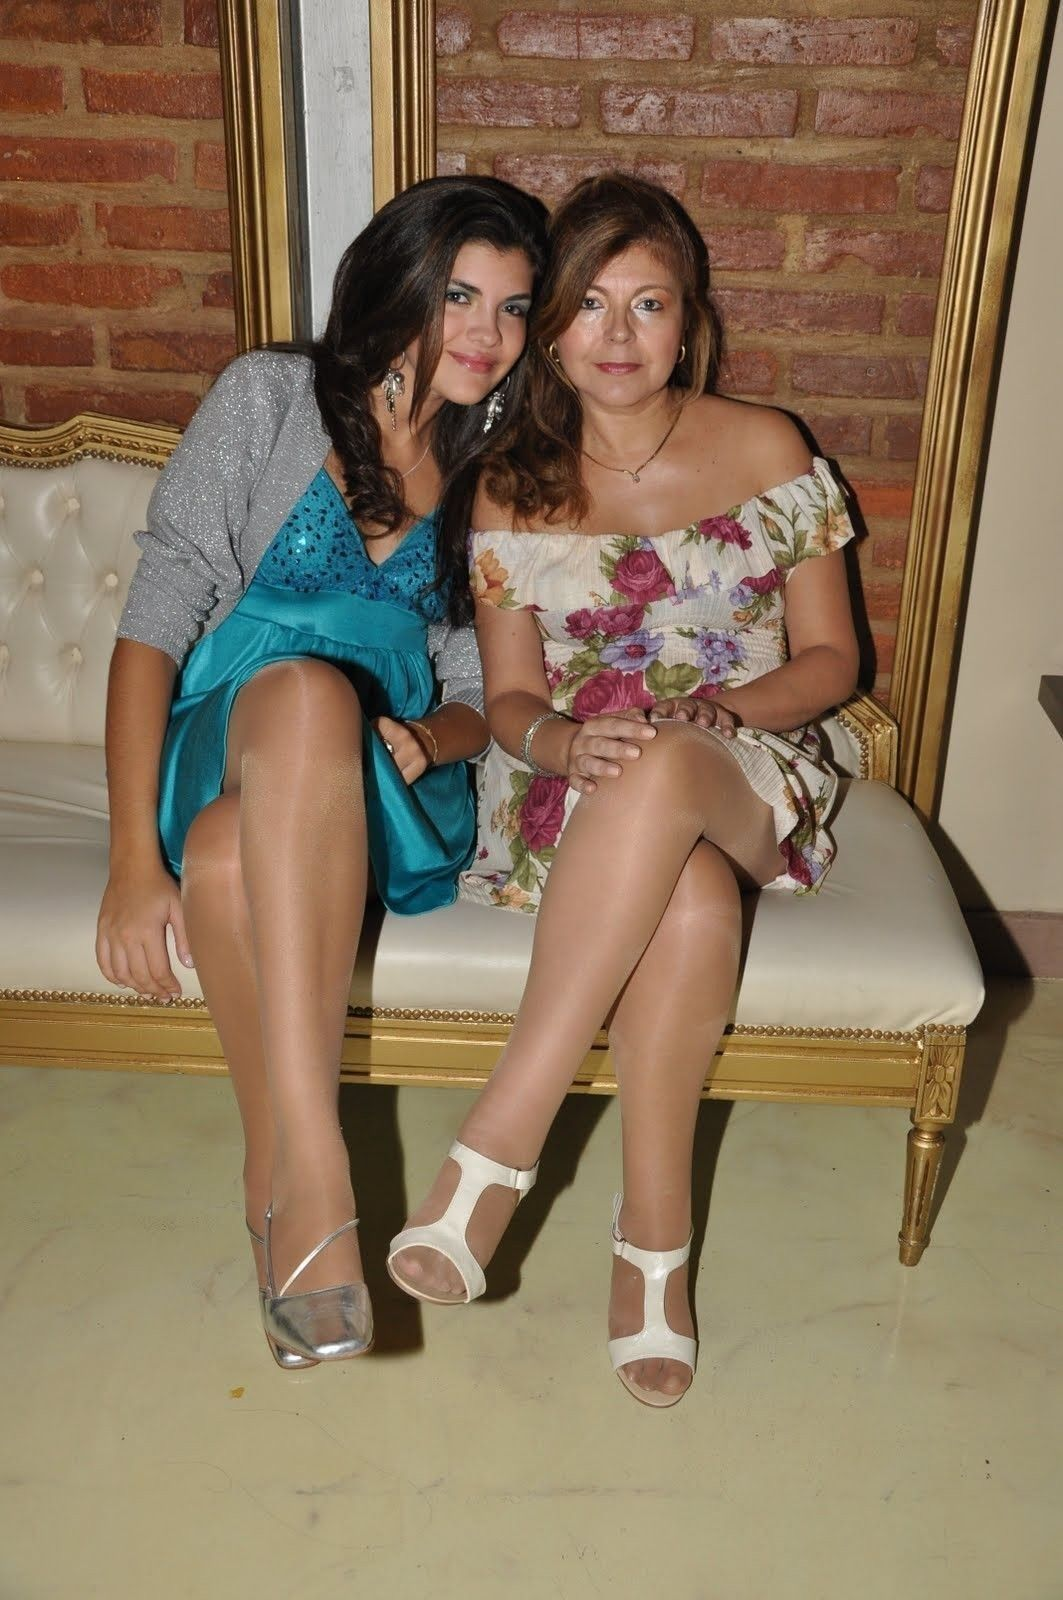 Pantyhose Two feet women mature